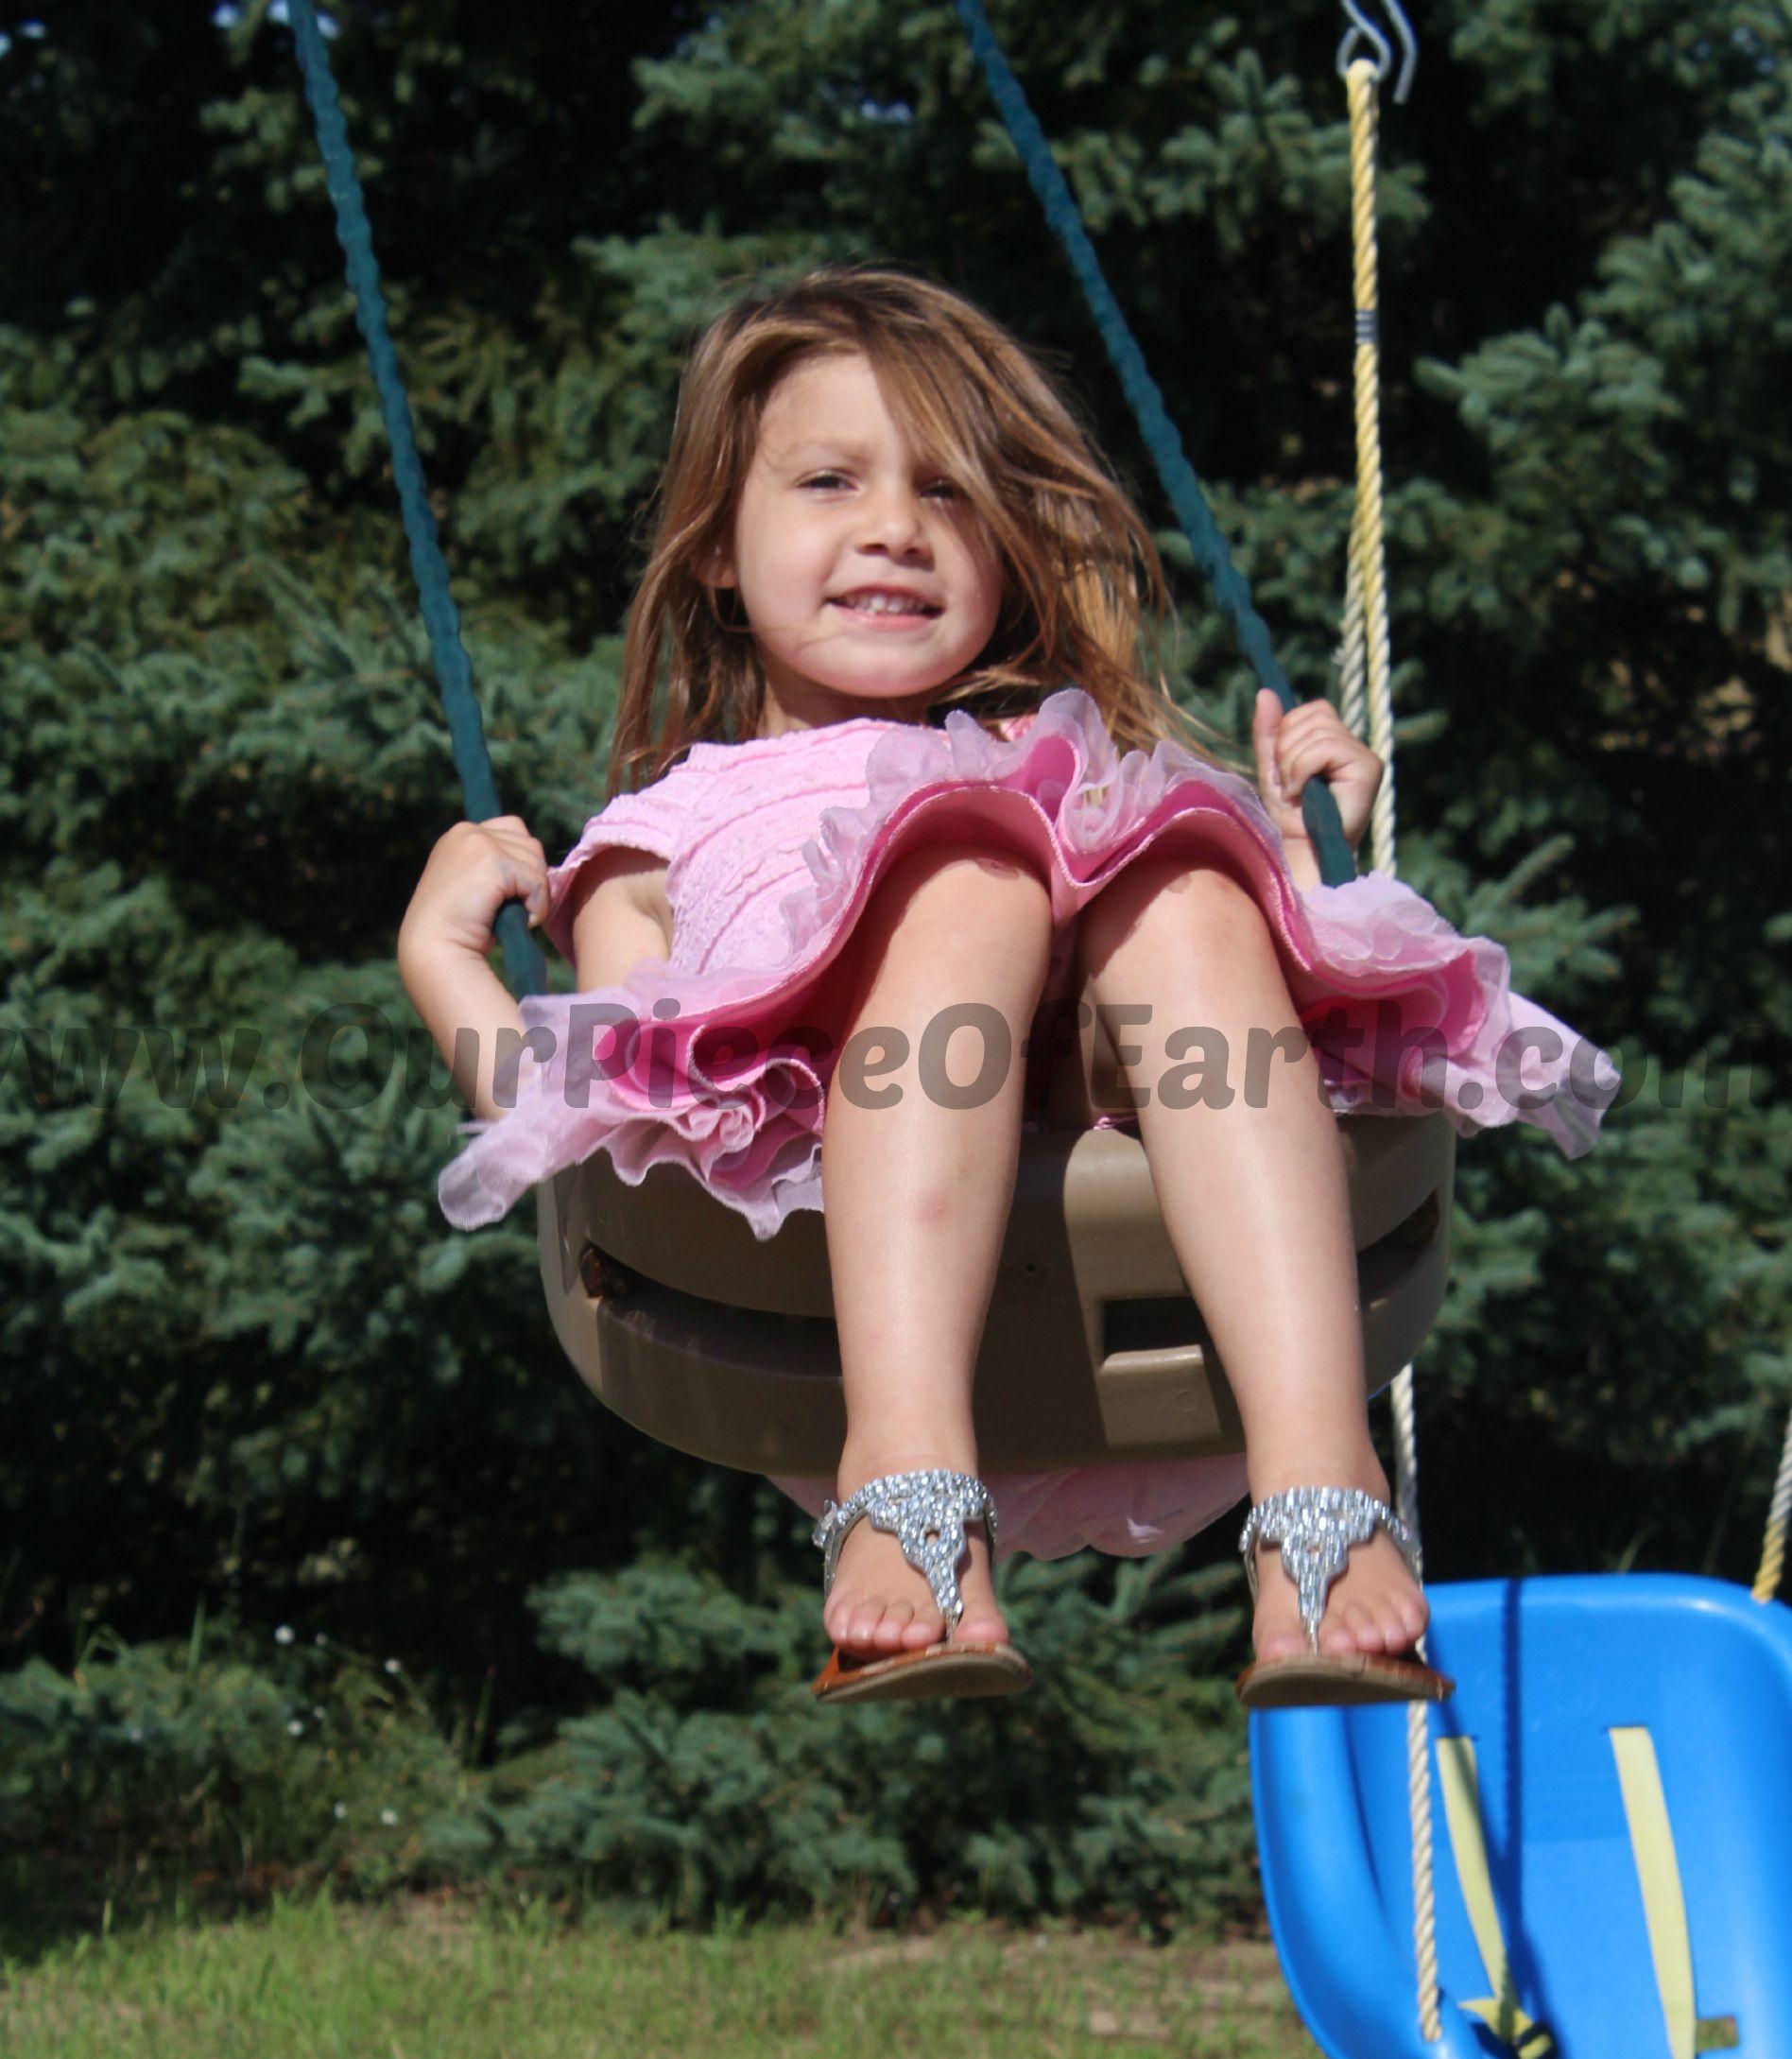 Maggie swinging